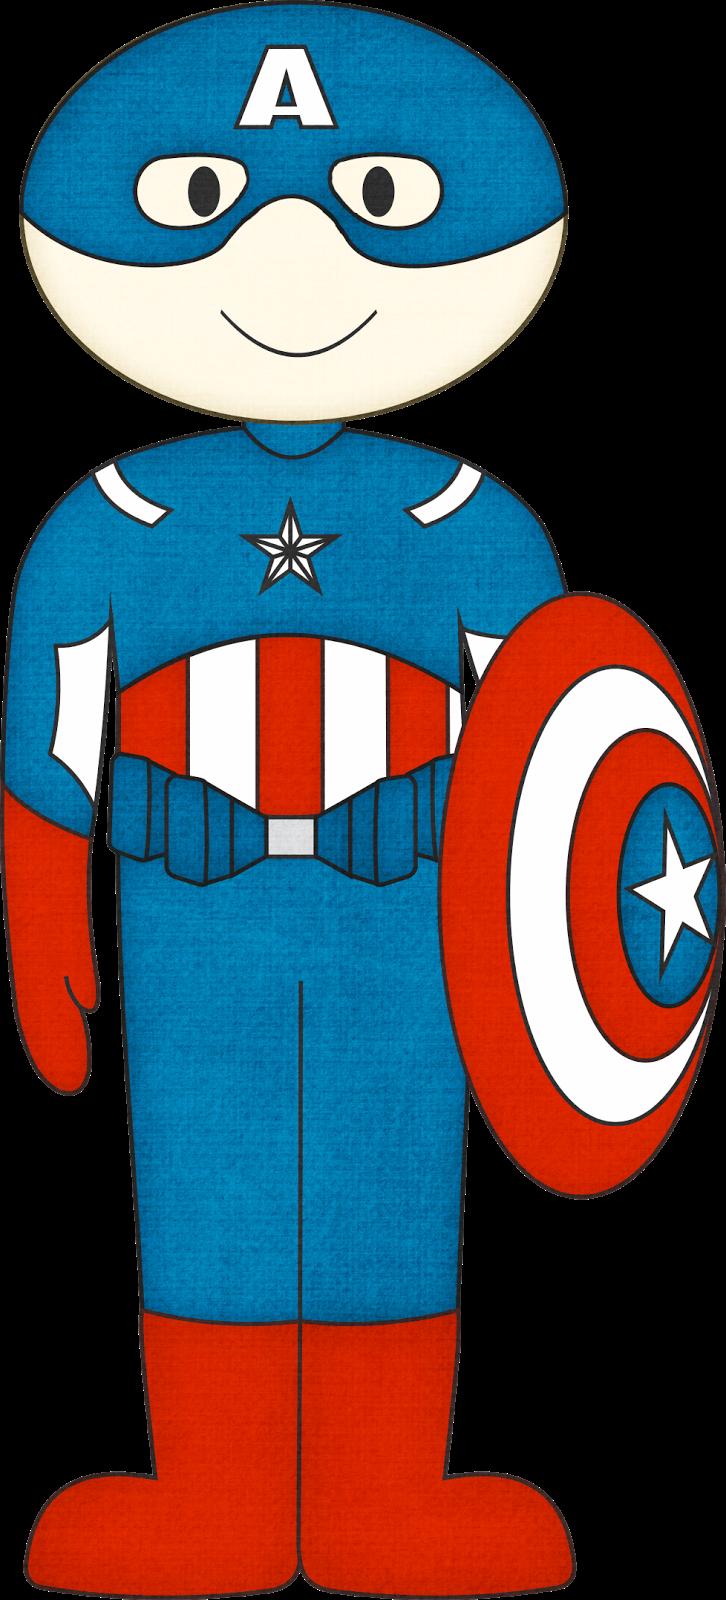 726x1600 Avengers Clipart.